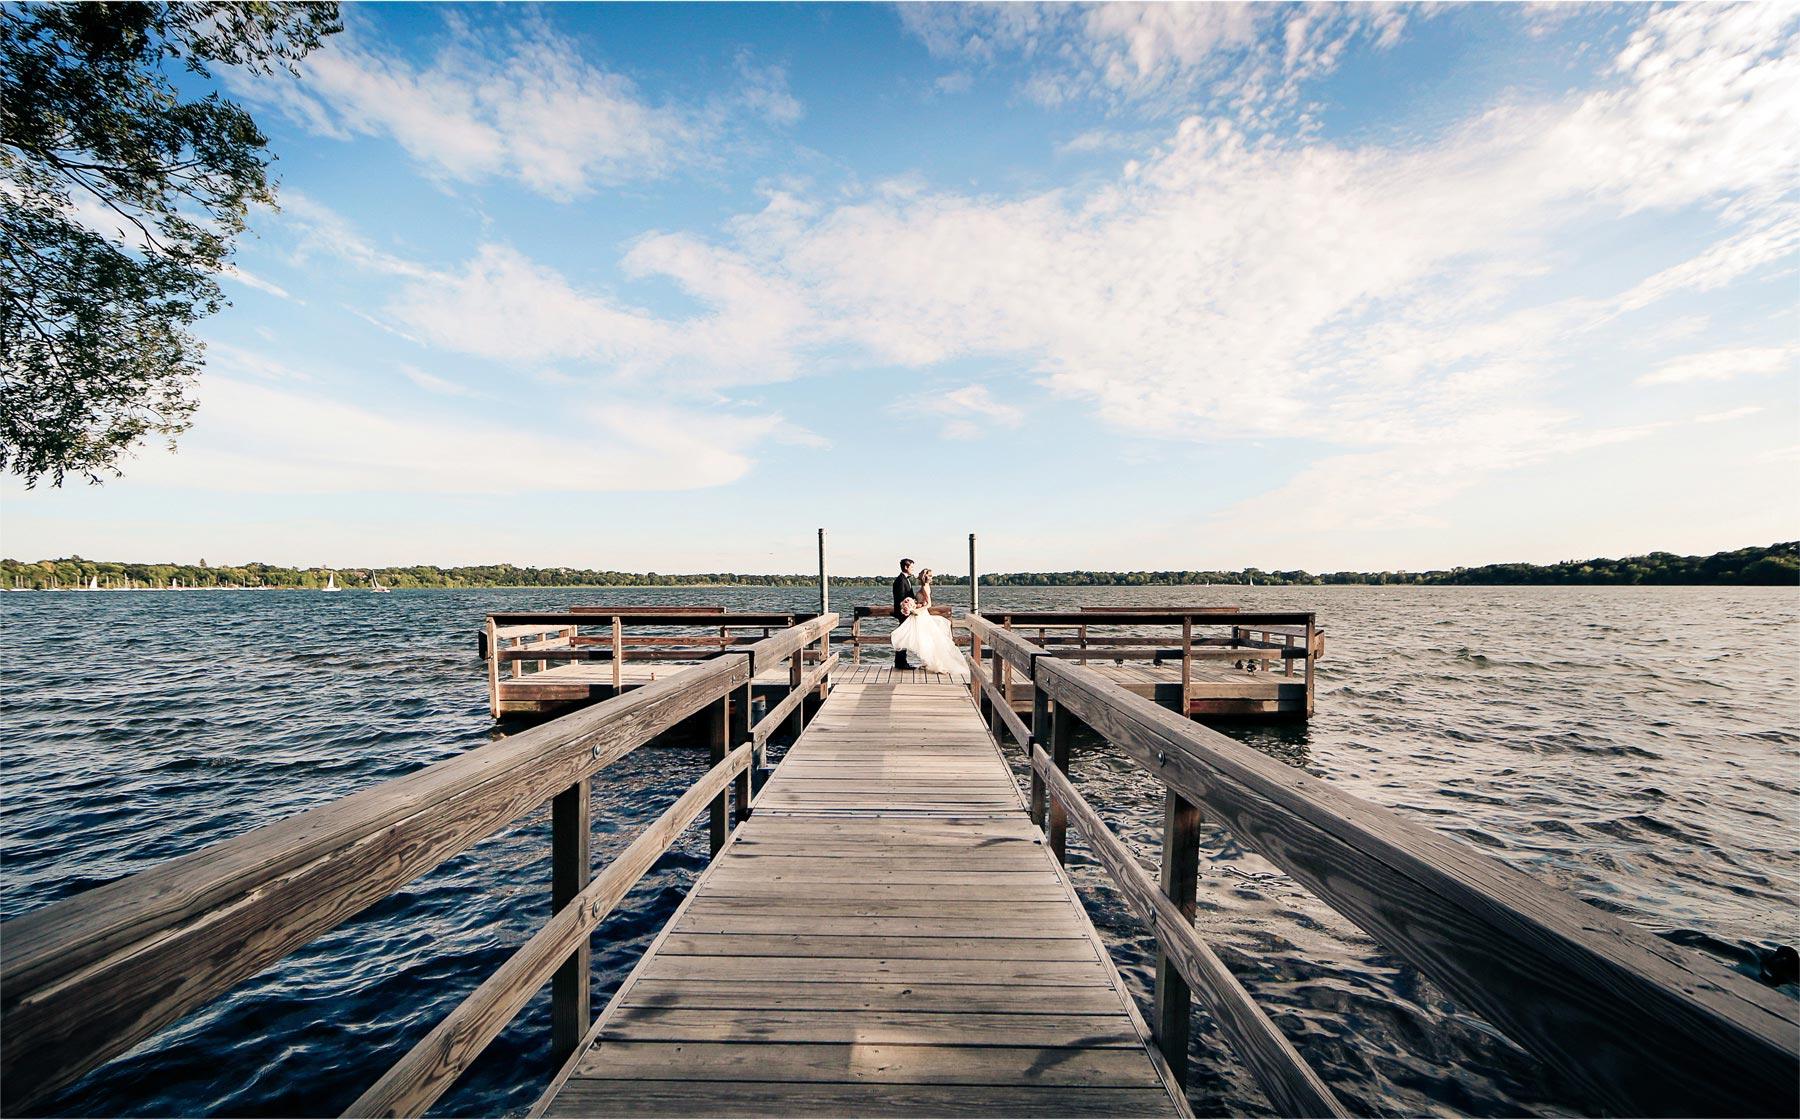 21-Minneapolis-Minnesota-Wedding-Photographer-by-Andrew-Vick-Photography-Summer-Lake-Calhoun-Bride-Groom-Docks-Vintage-Michelle-and-Kevin.jpg